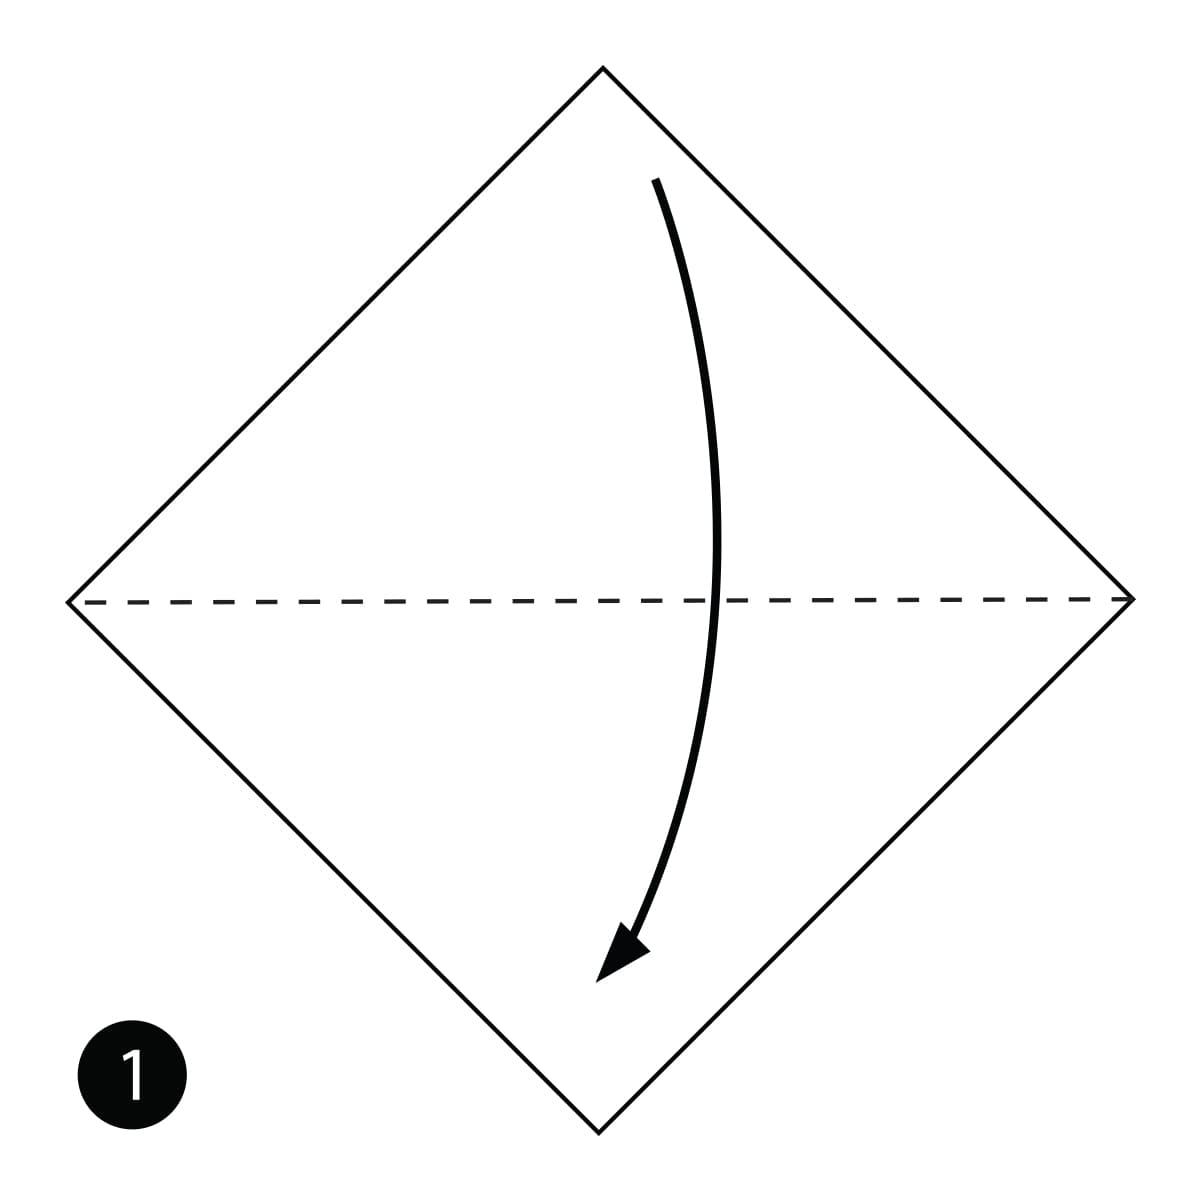 Tadpole Step 1